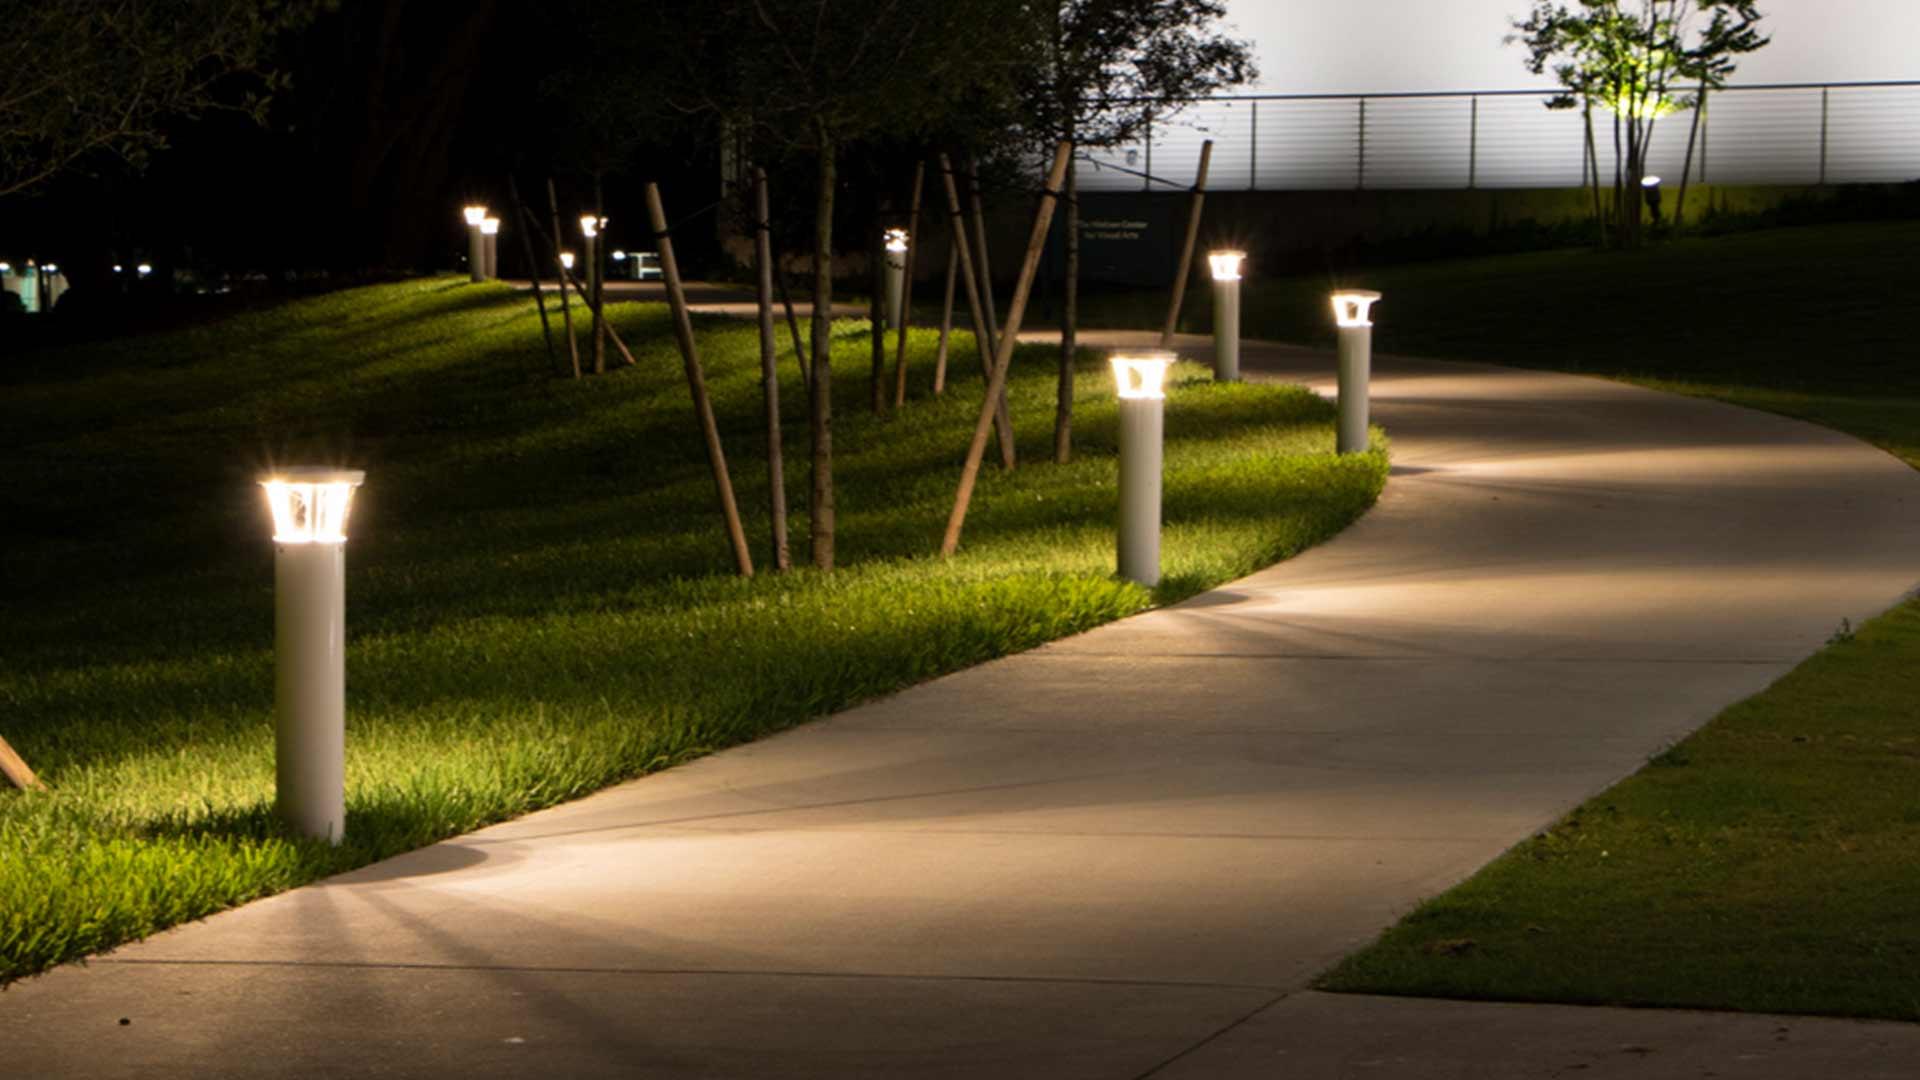 Sidewalk with decorative lighting